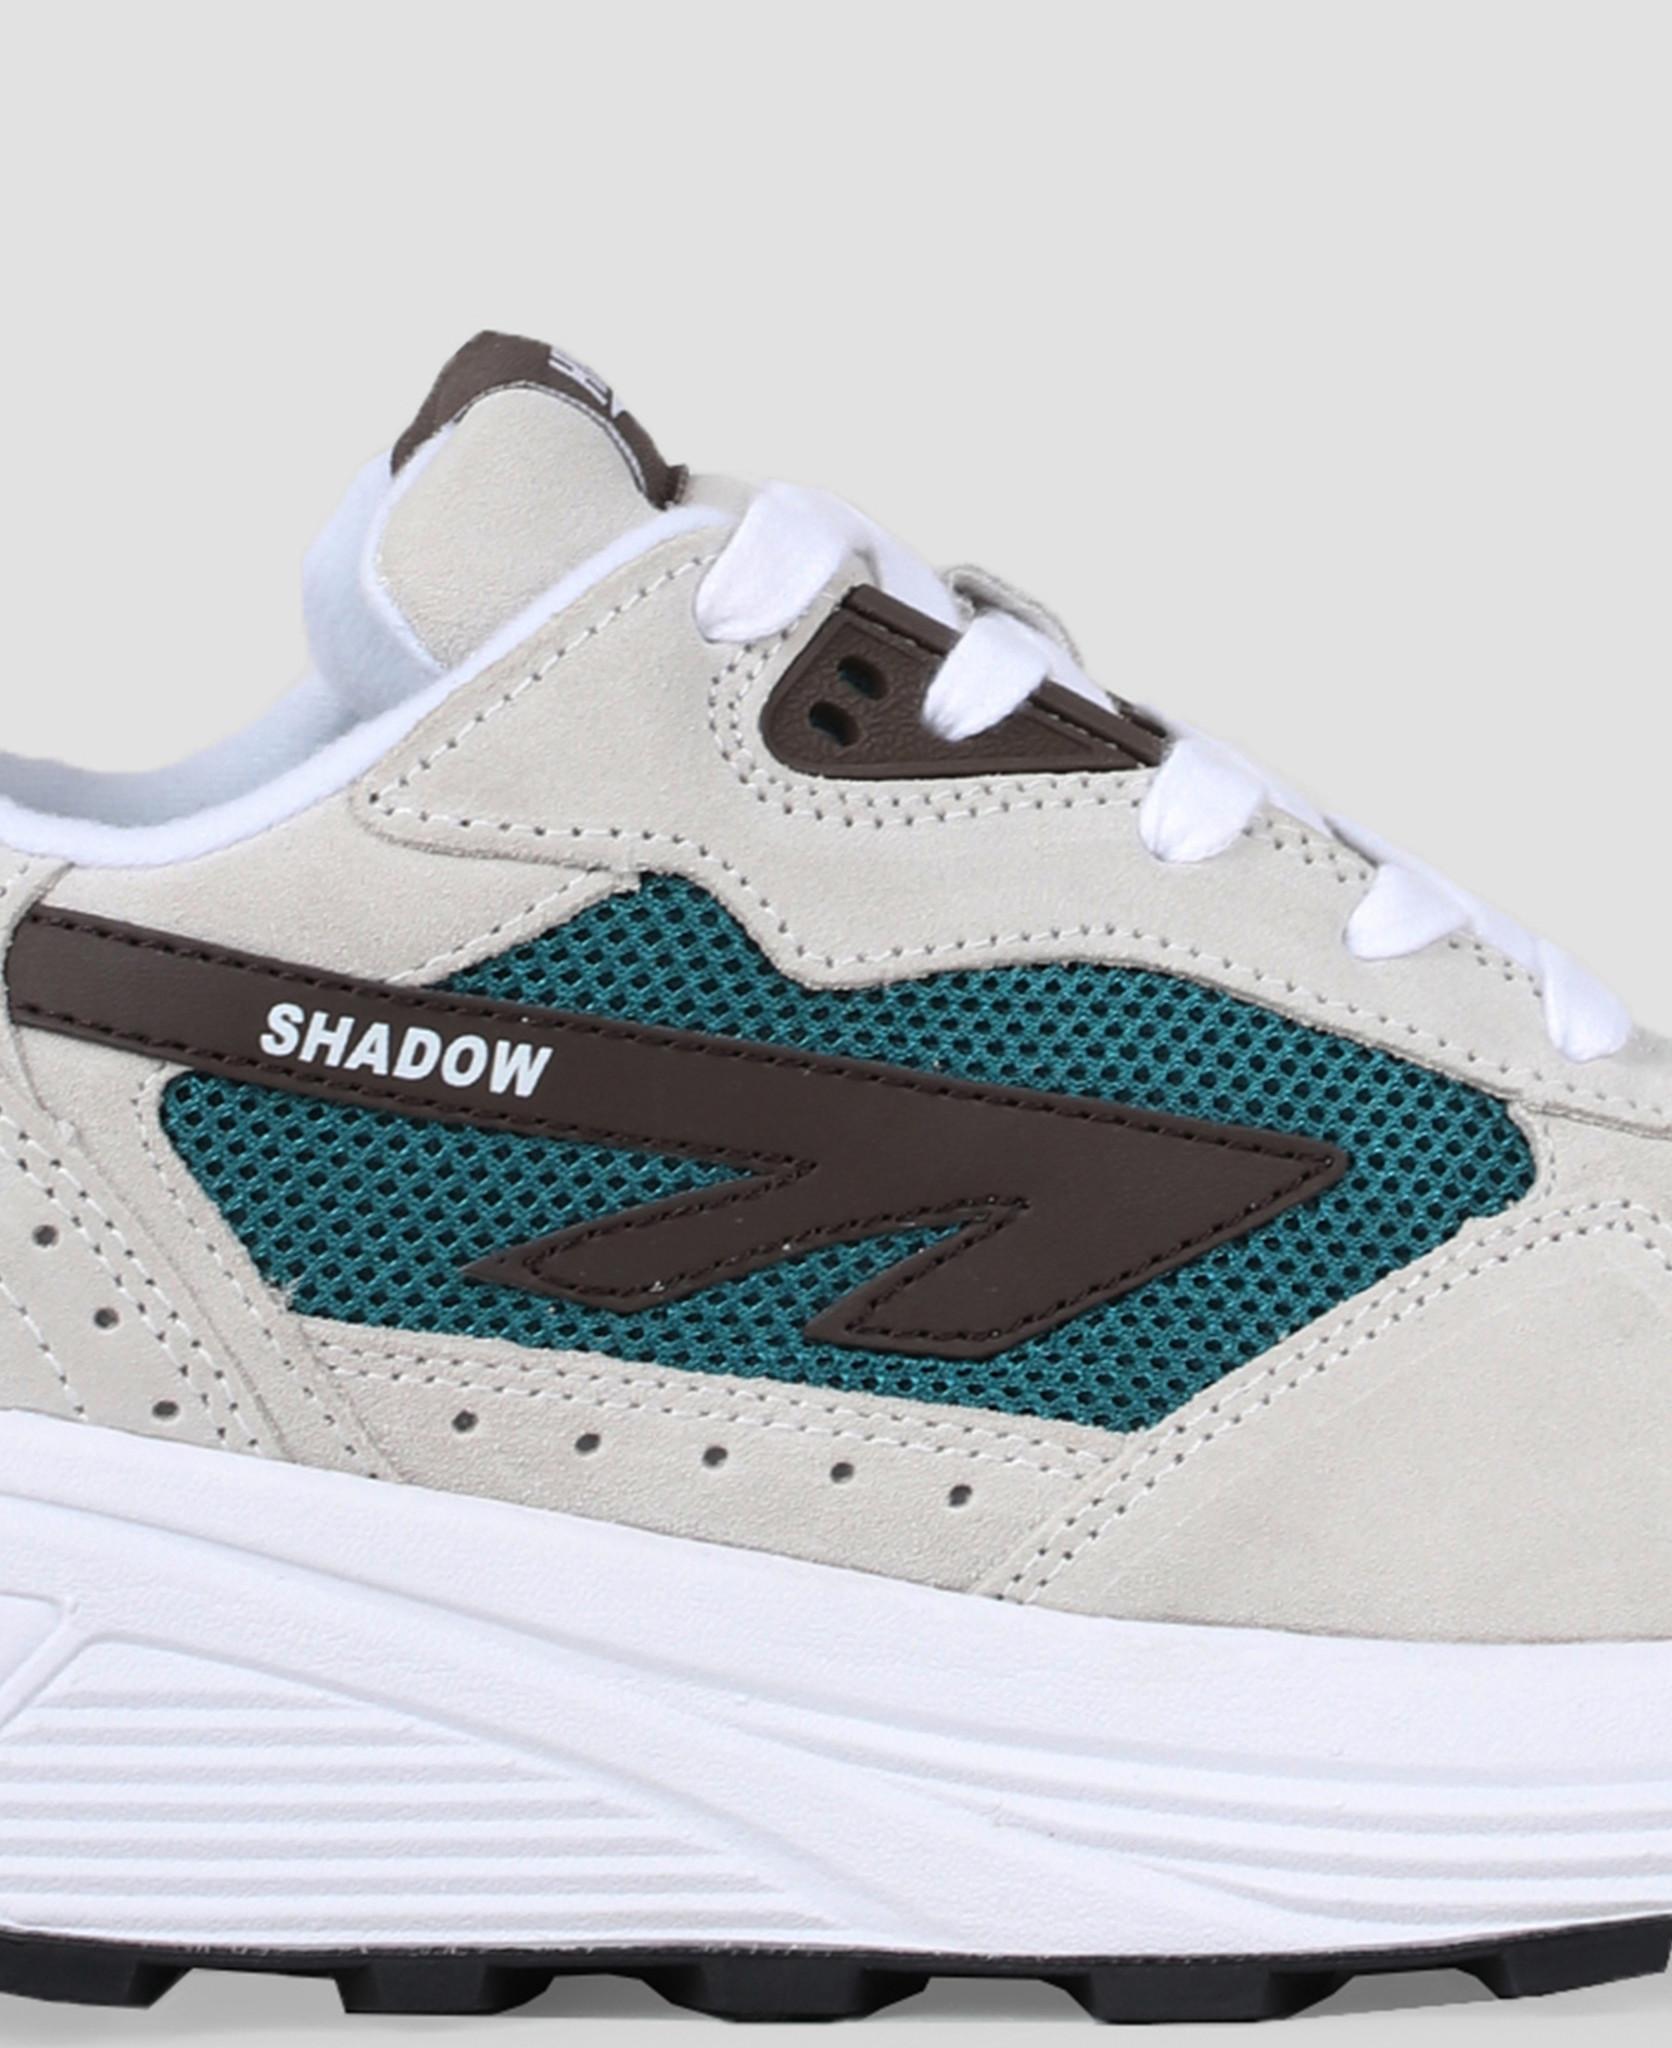 Hi-Tec Hi-Tec HTS Silver Shadow RGS Off White Teal Brown K010002-062